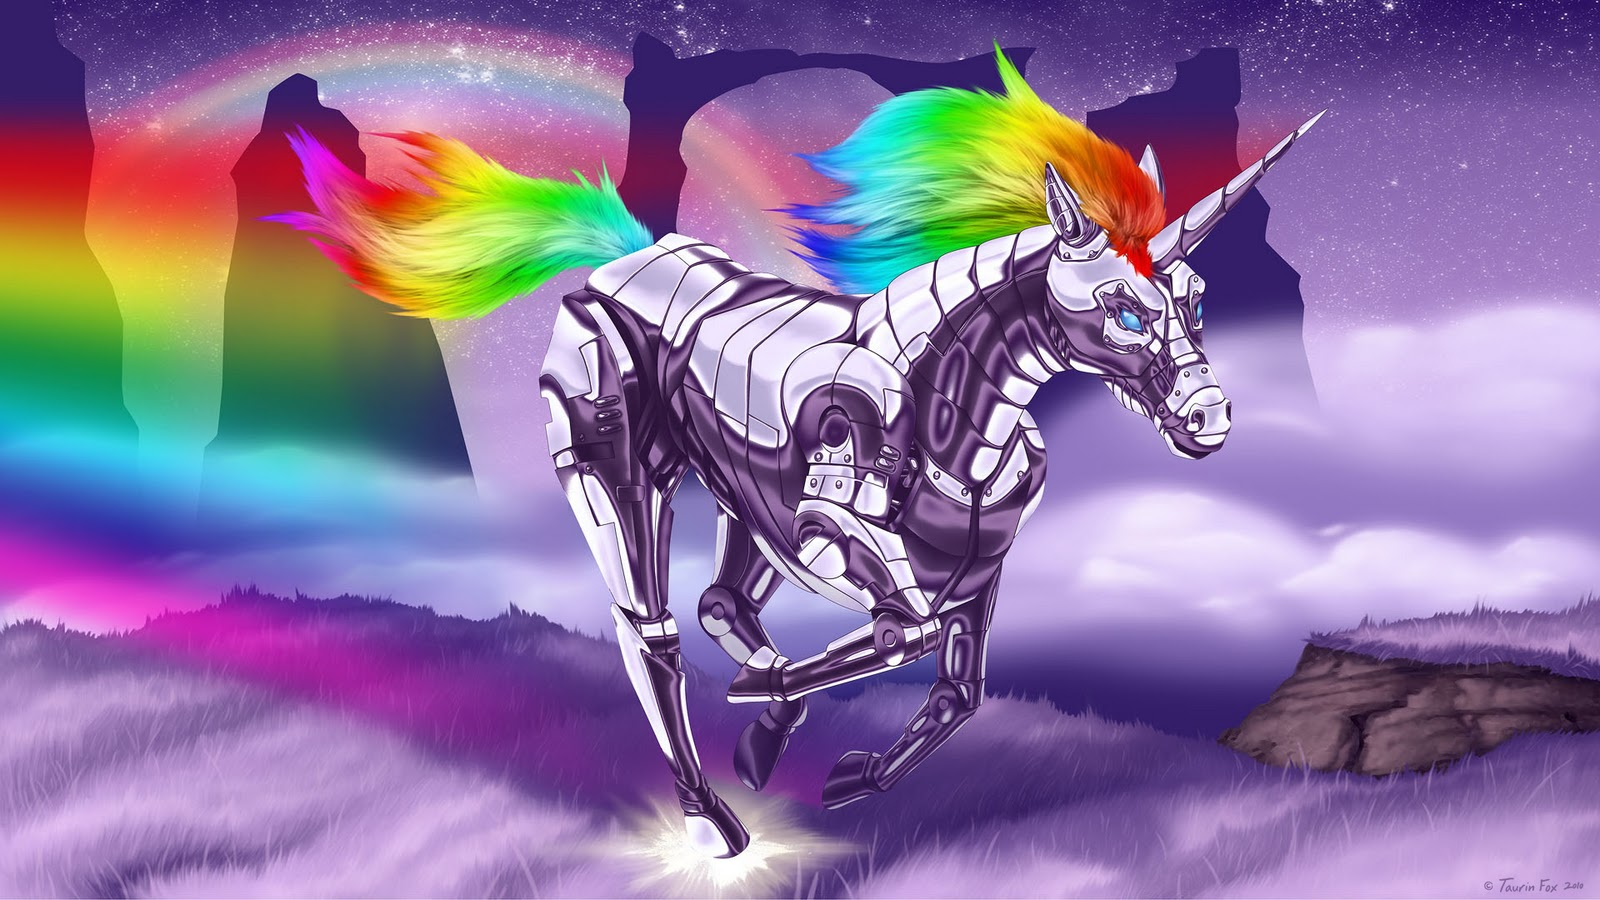 Rainbow Unicorns images Rainbow Unicorns HD wallpaper and ...